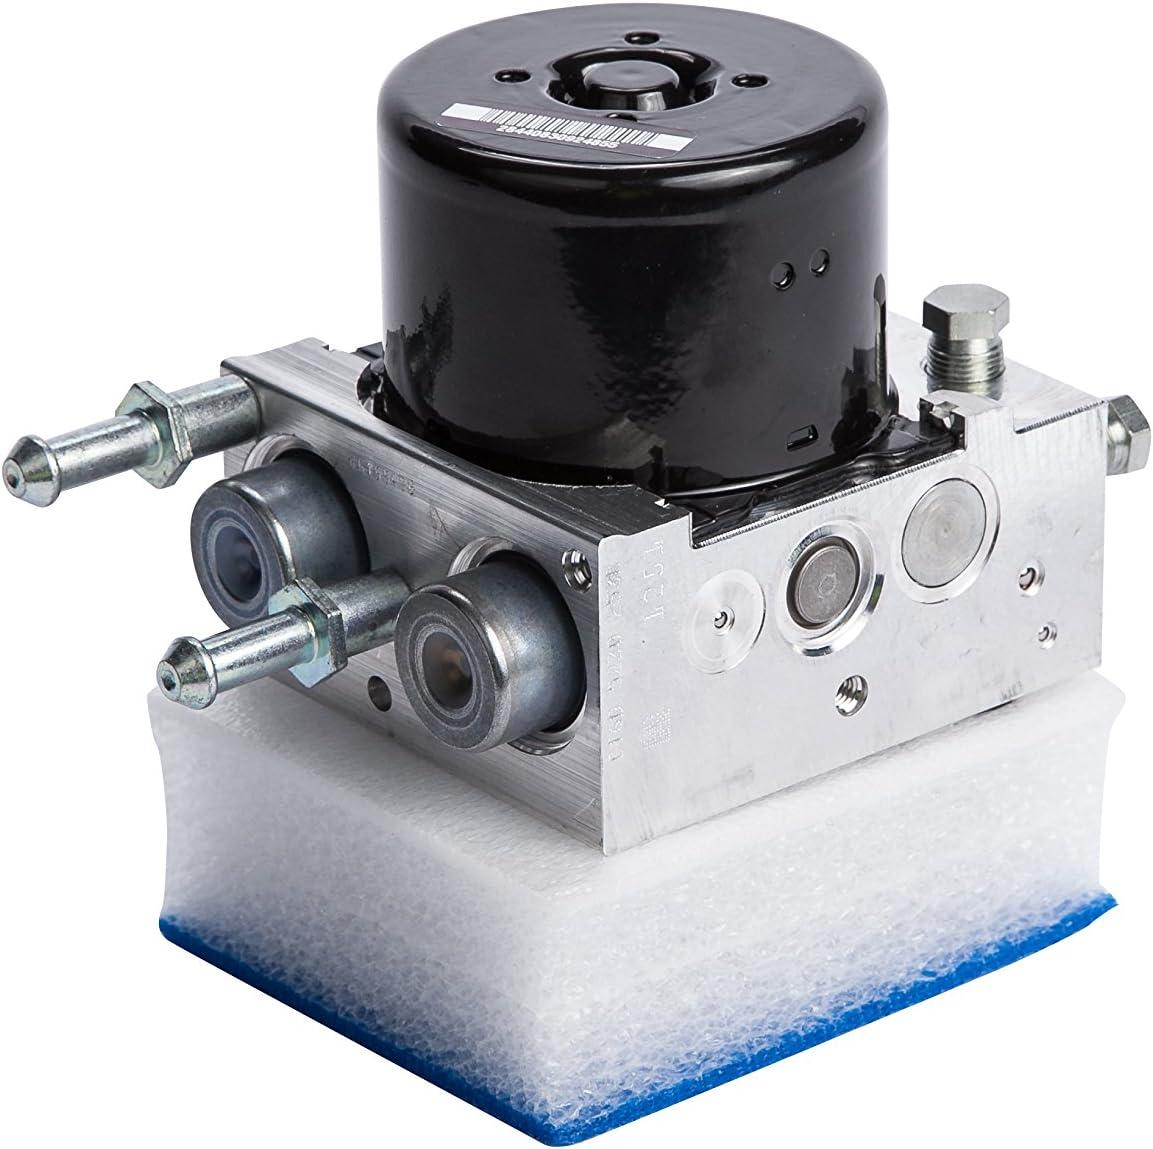 GM Genuine Parts 19301495 Brake outlet Modulator Kit Cheap wit Pressure Valve